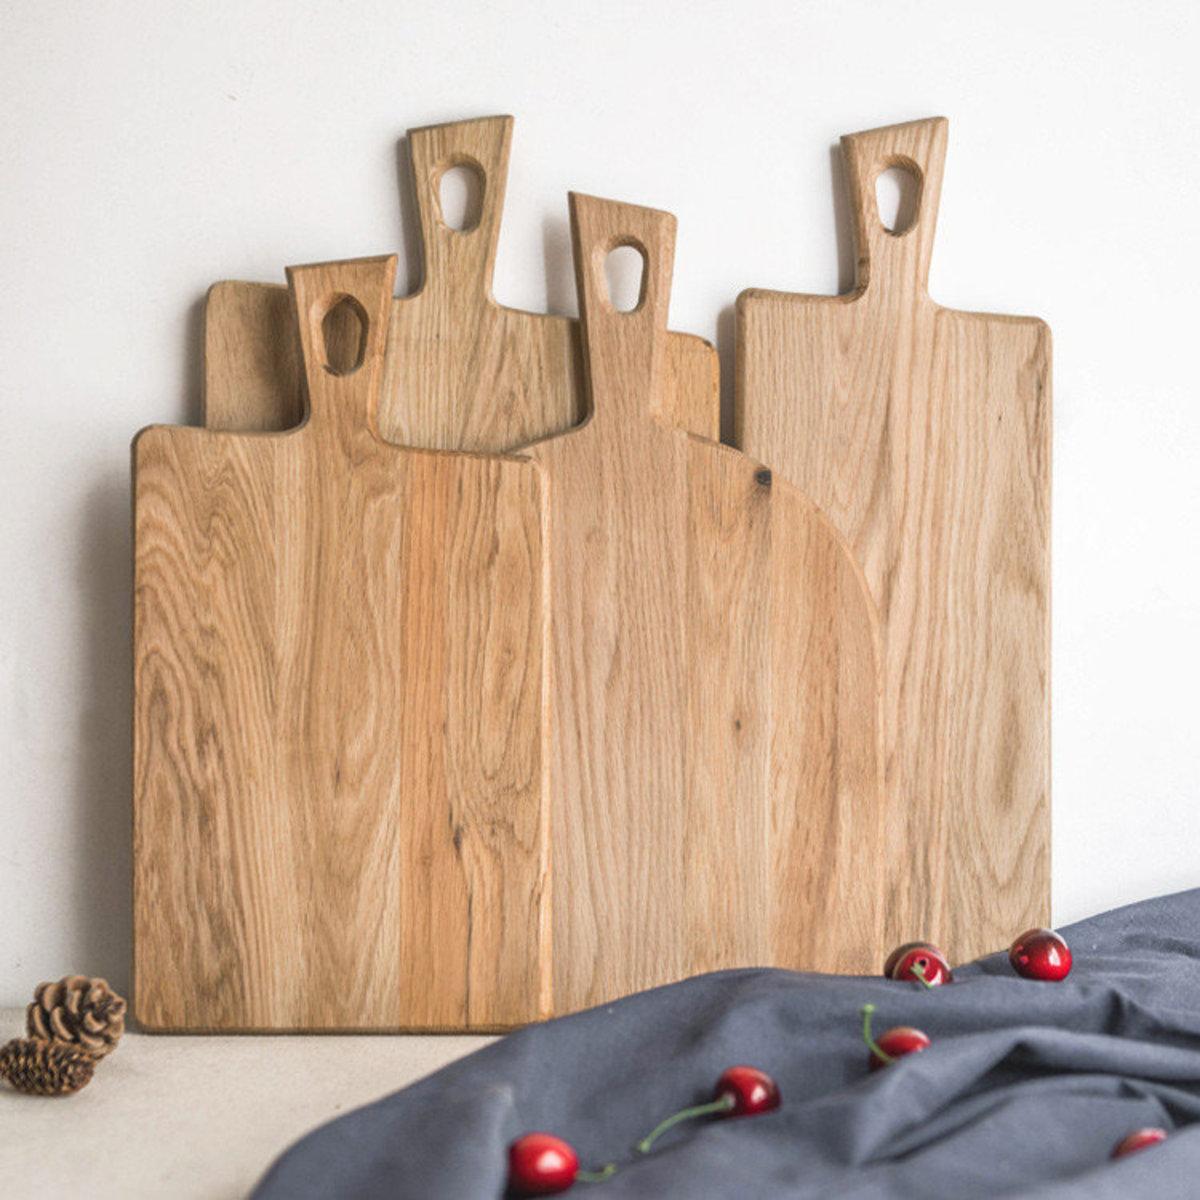 Household solid wood cut cooked food cutting board (semicircular board)